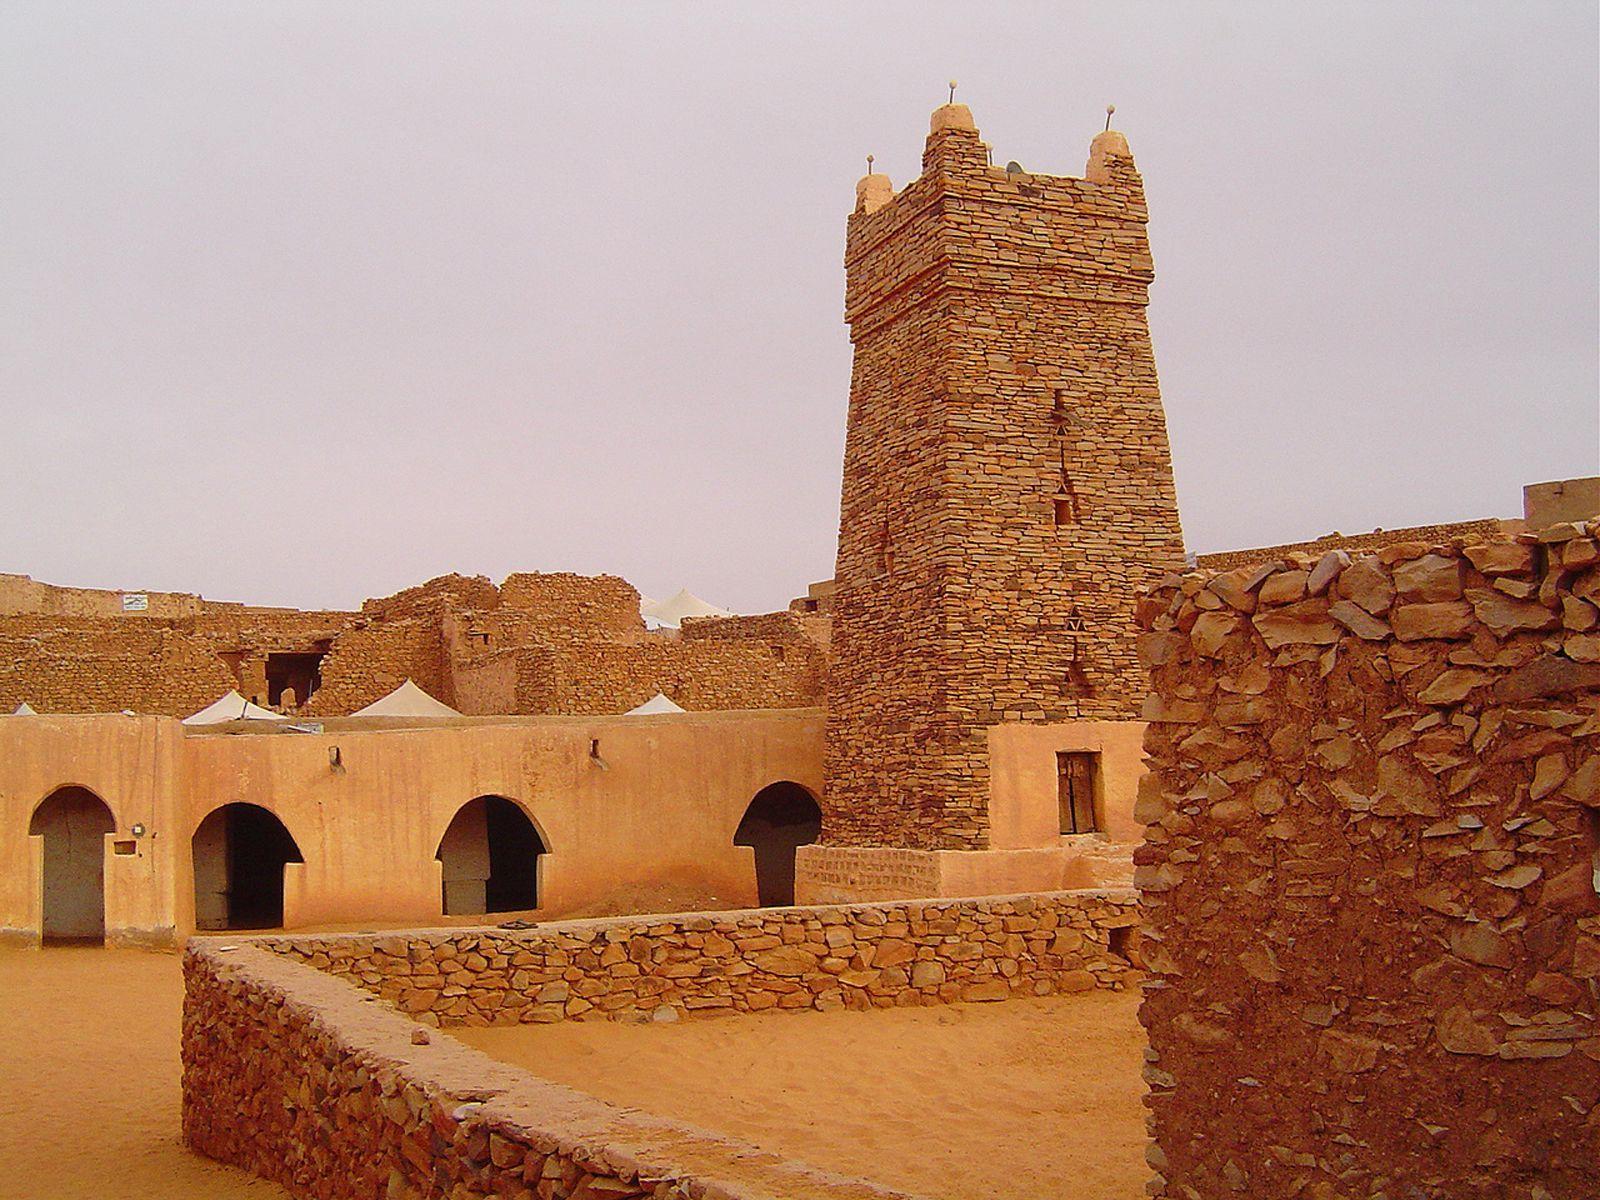 Image De Chinguetti à Terjit, oasis de l'Adrar